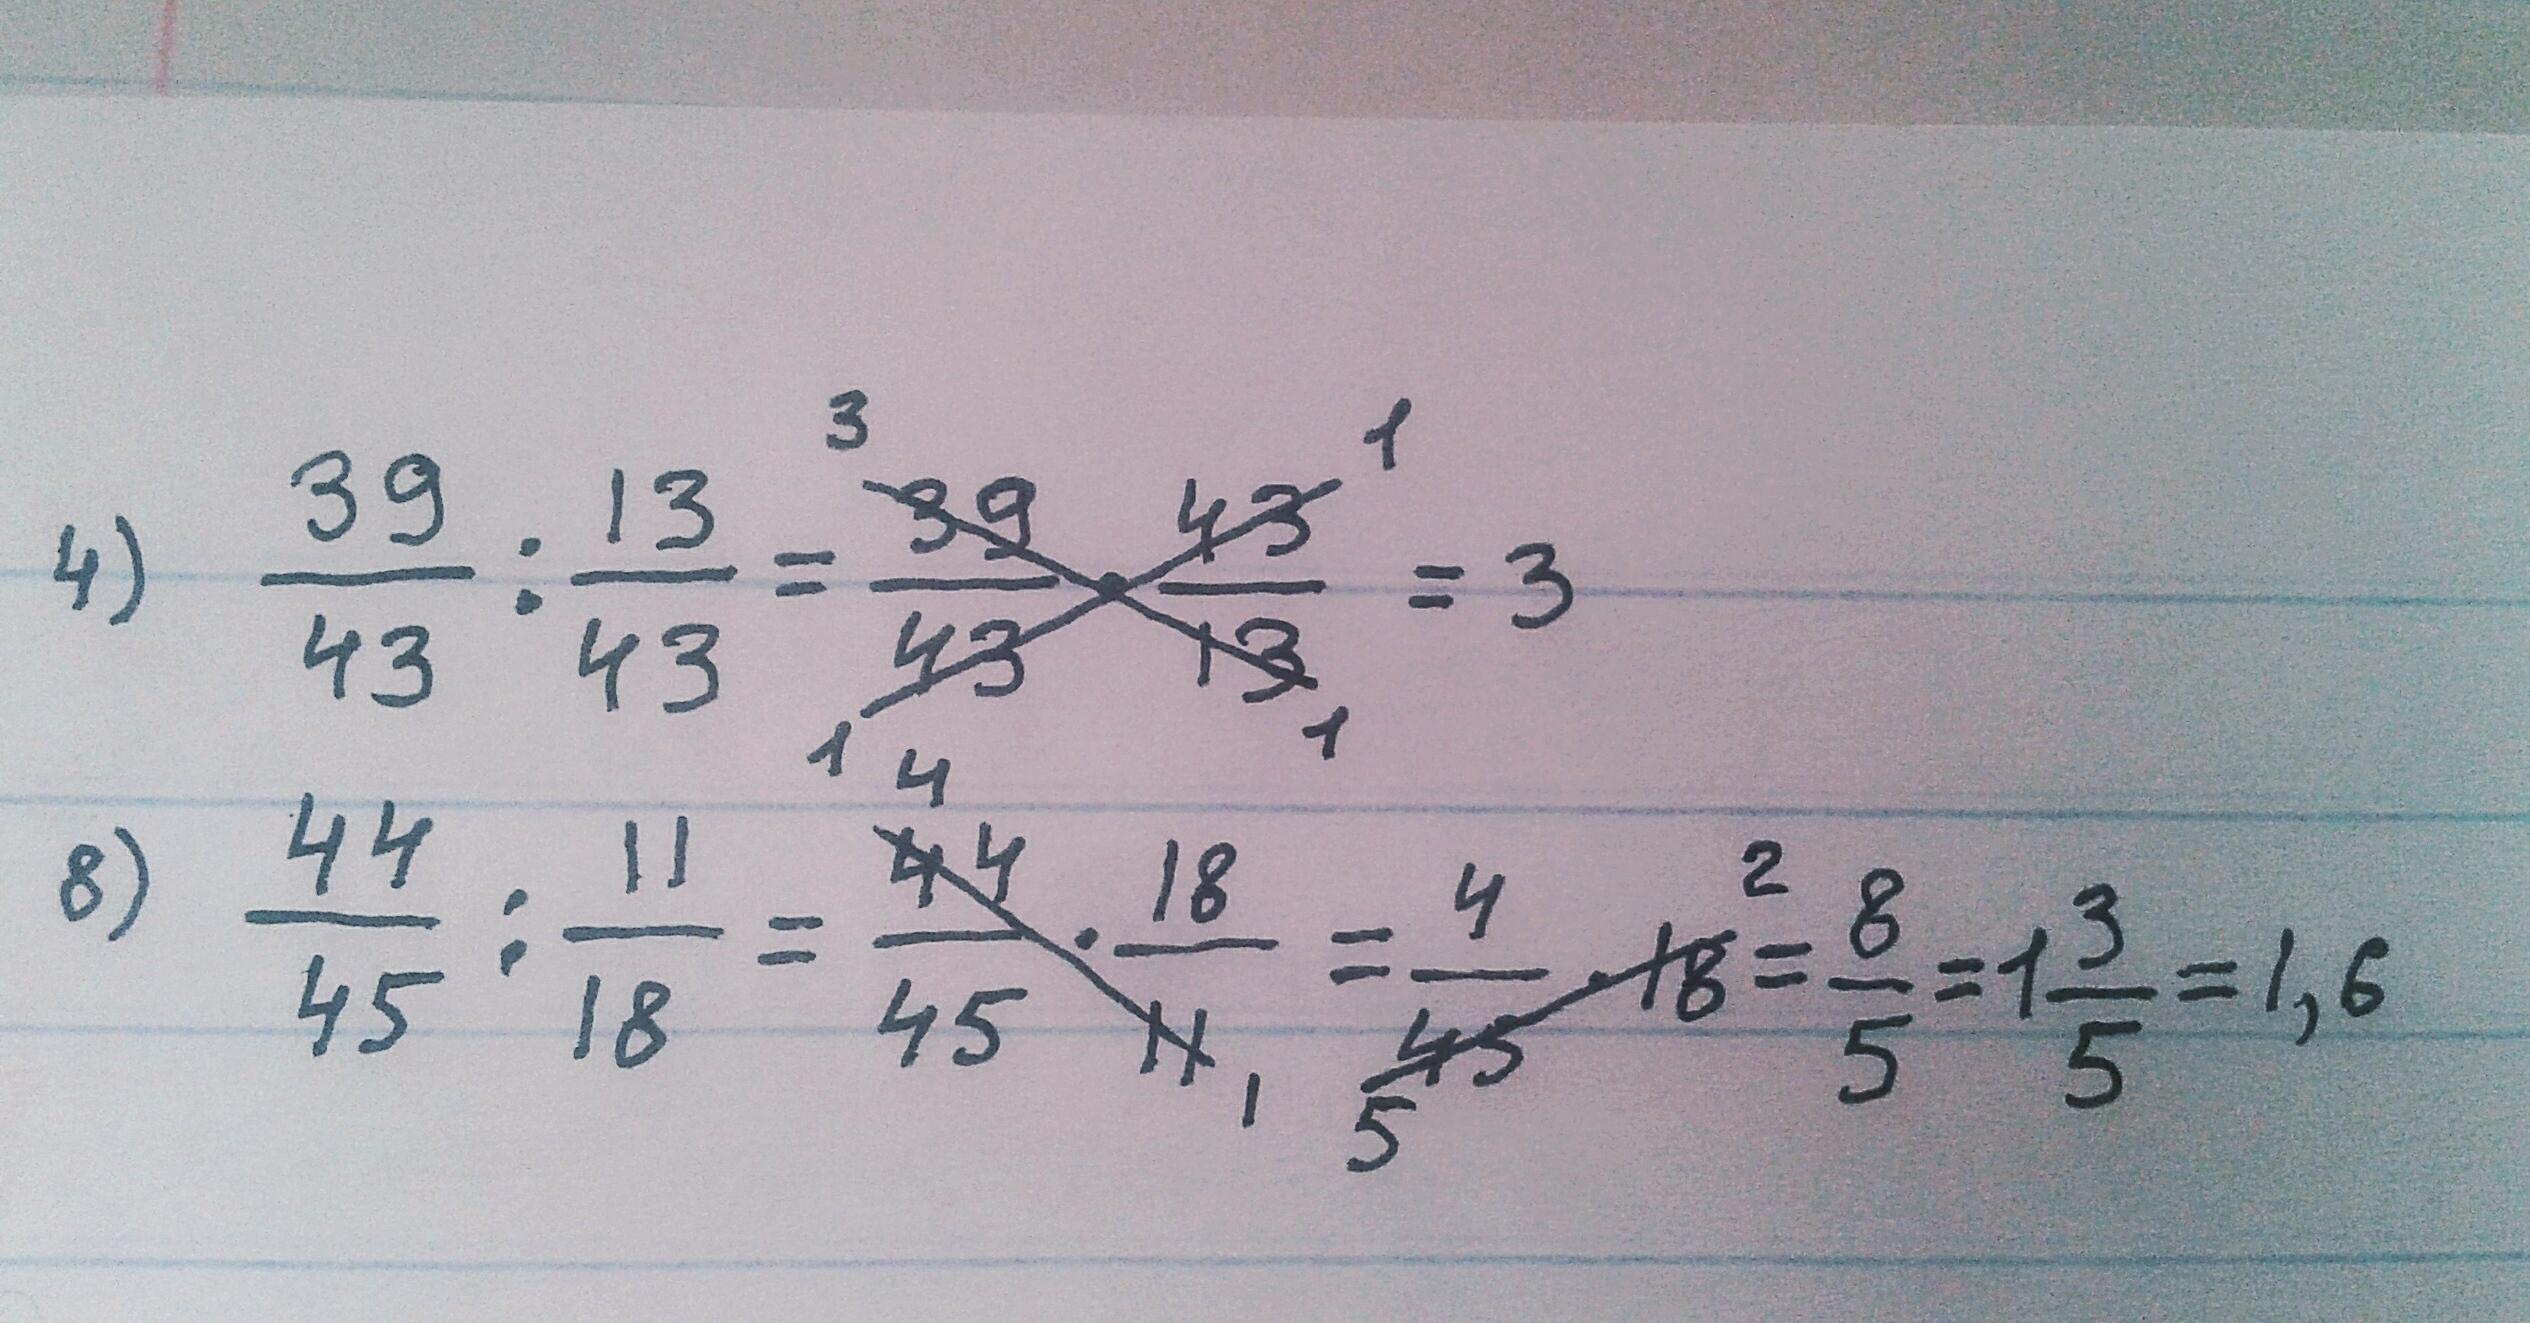 4) 3<br>8) 1 целая 3/5 ( или 1,6)